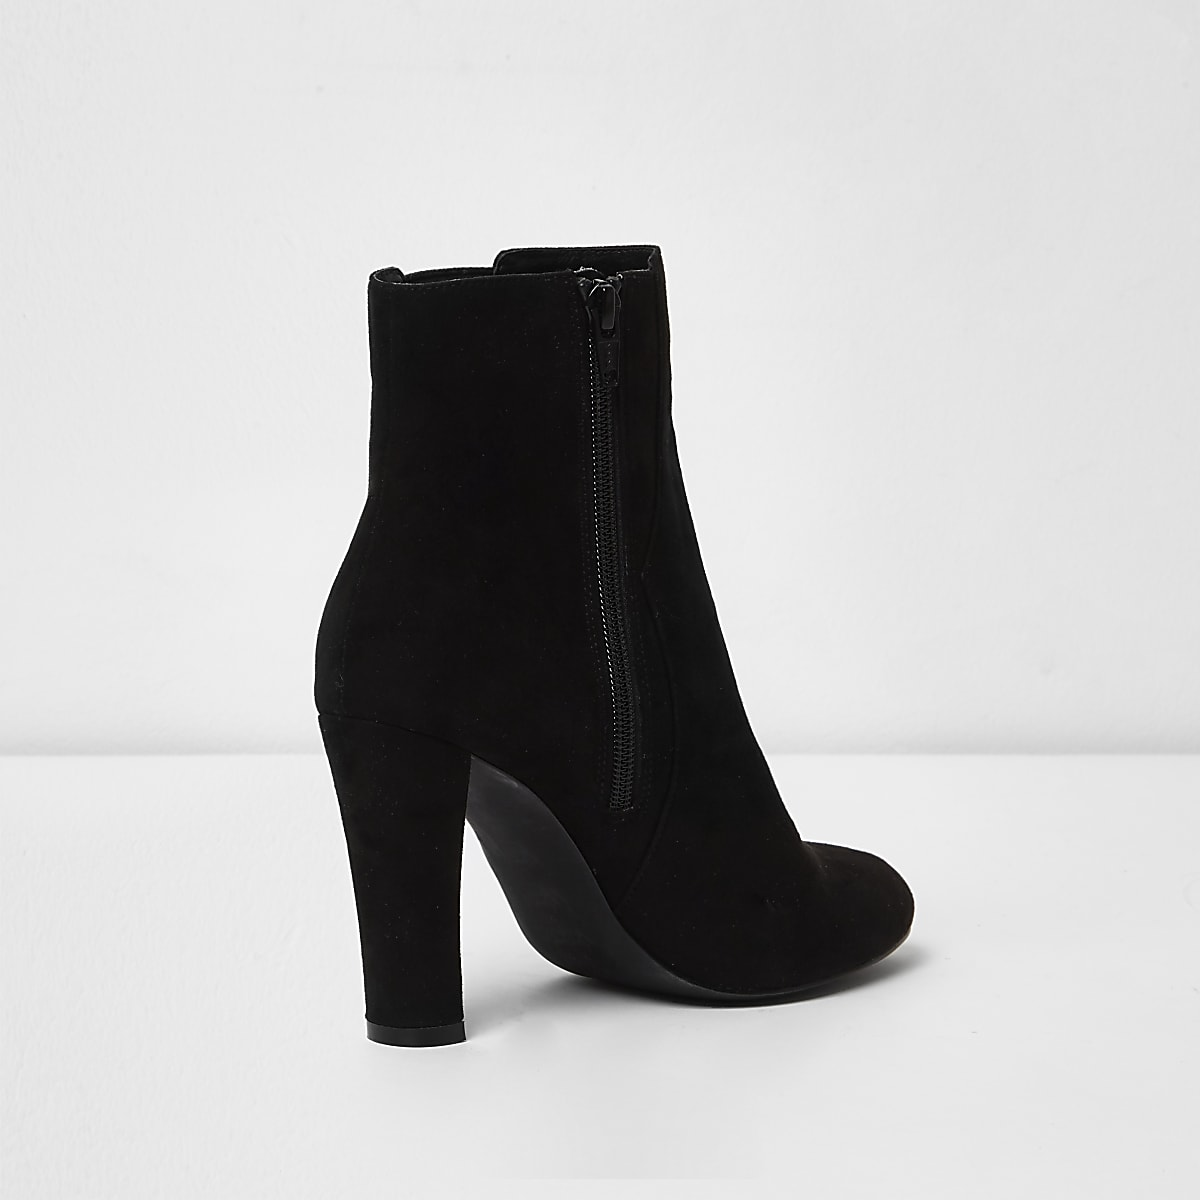 2538b99bb0c3d Black heeled chelsea boots - Boots - Shoes & Boots - women